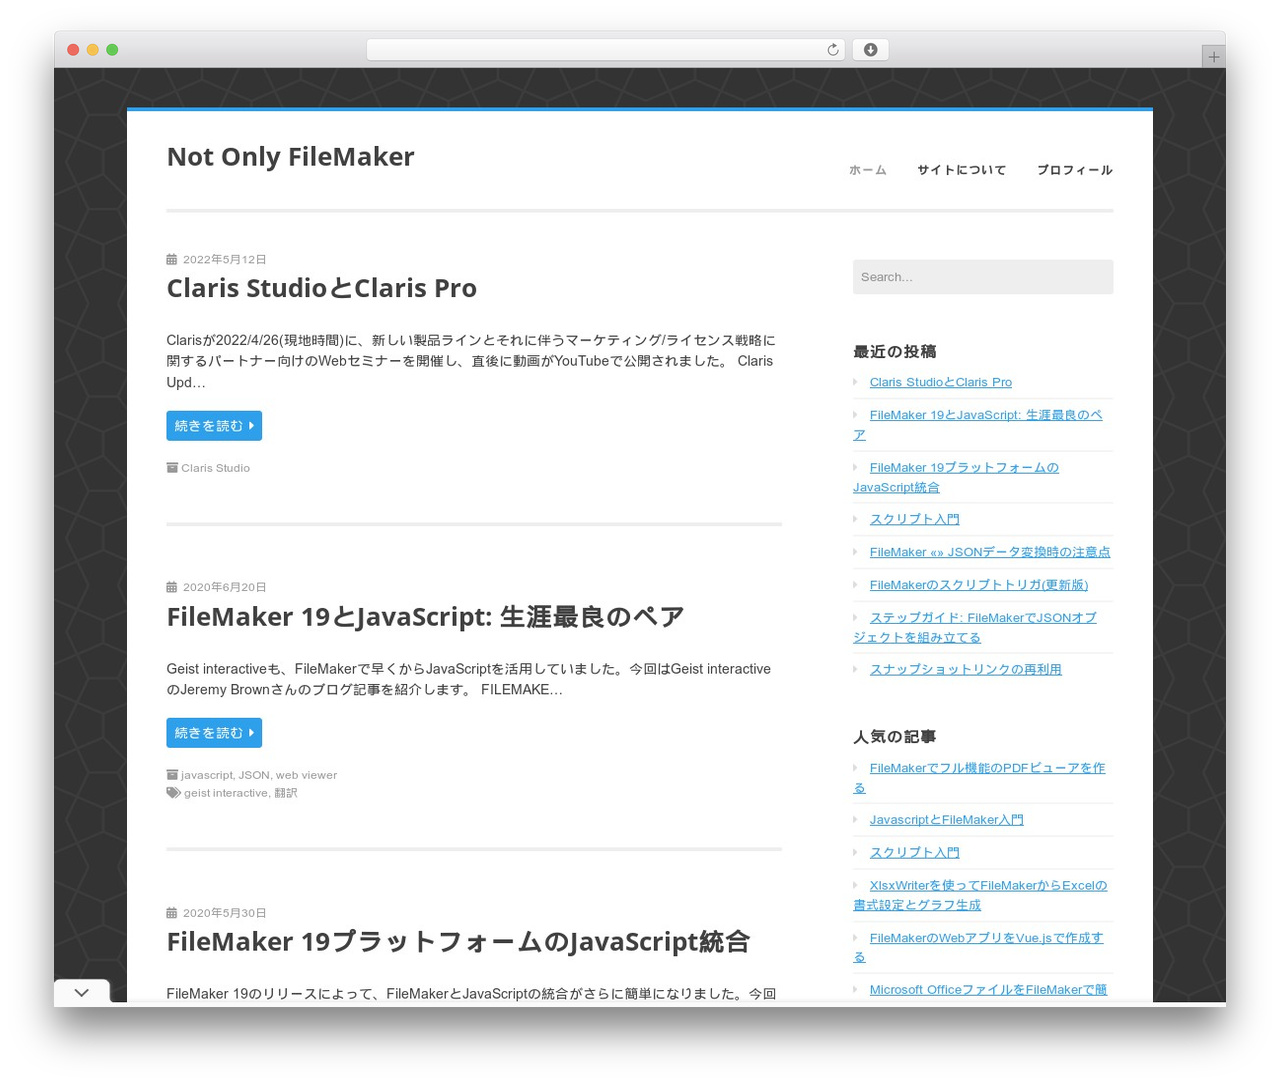 WordPress website template Enterprise Lite by Sean Davis